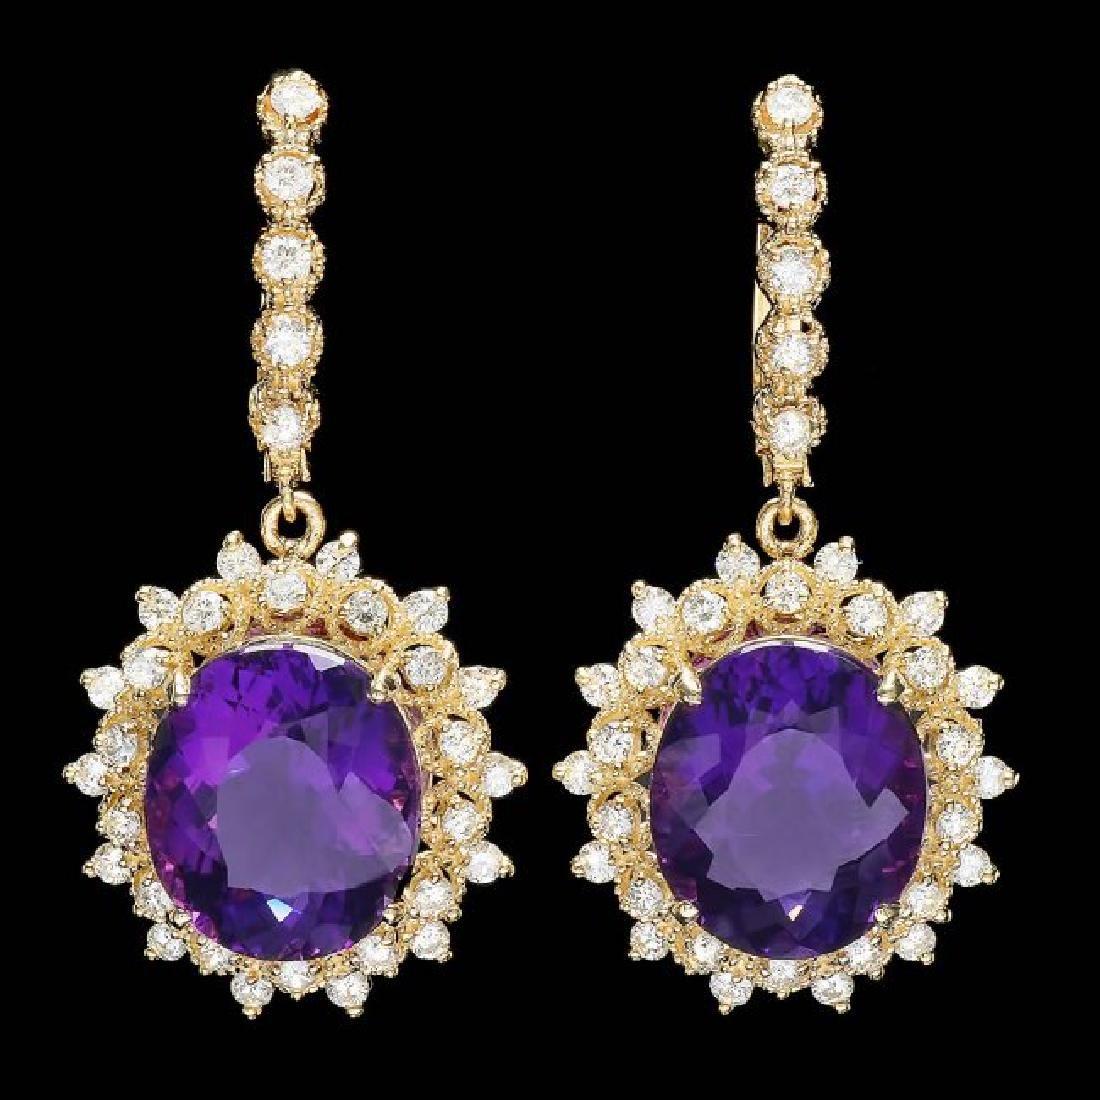 14k Gold 16ct Amethyst 1.8ct Diamond Earrings